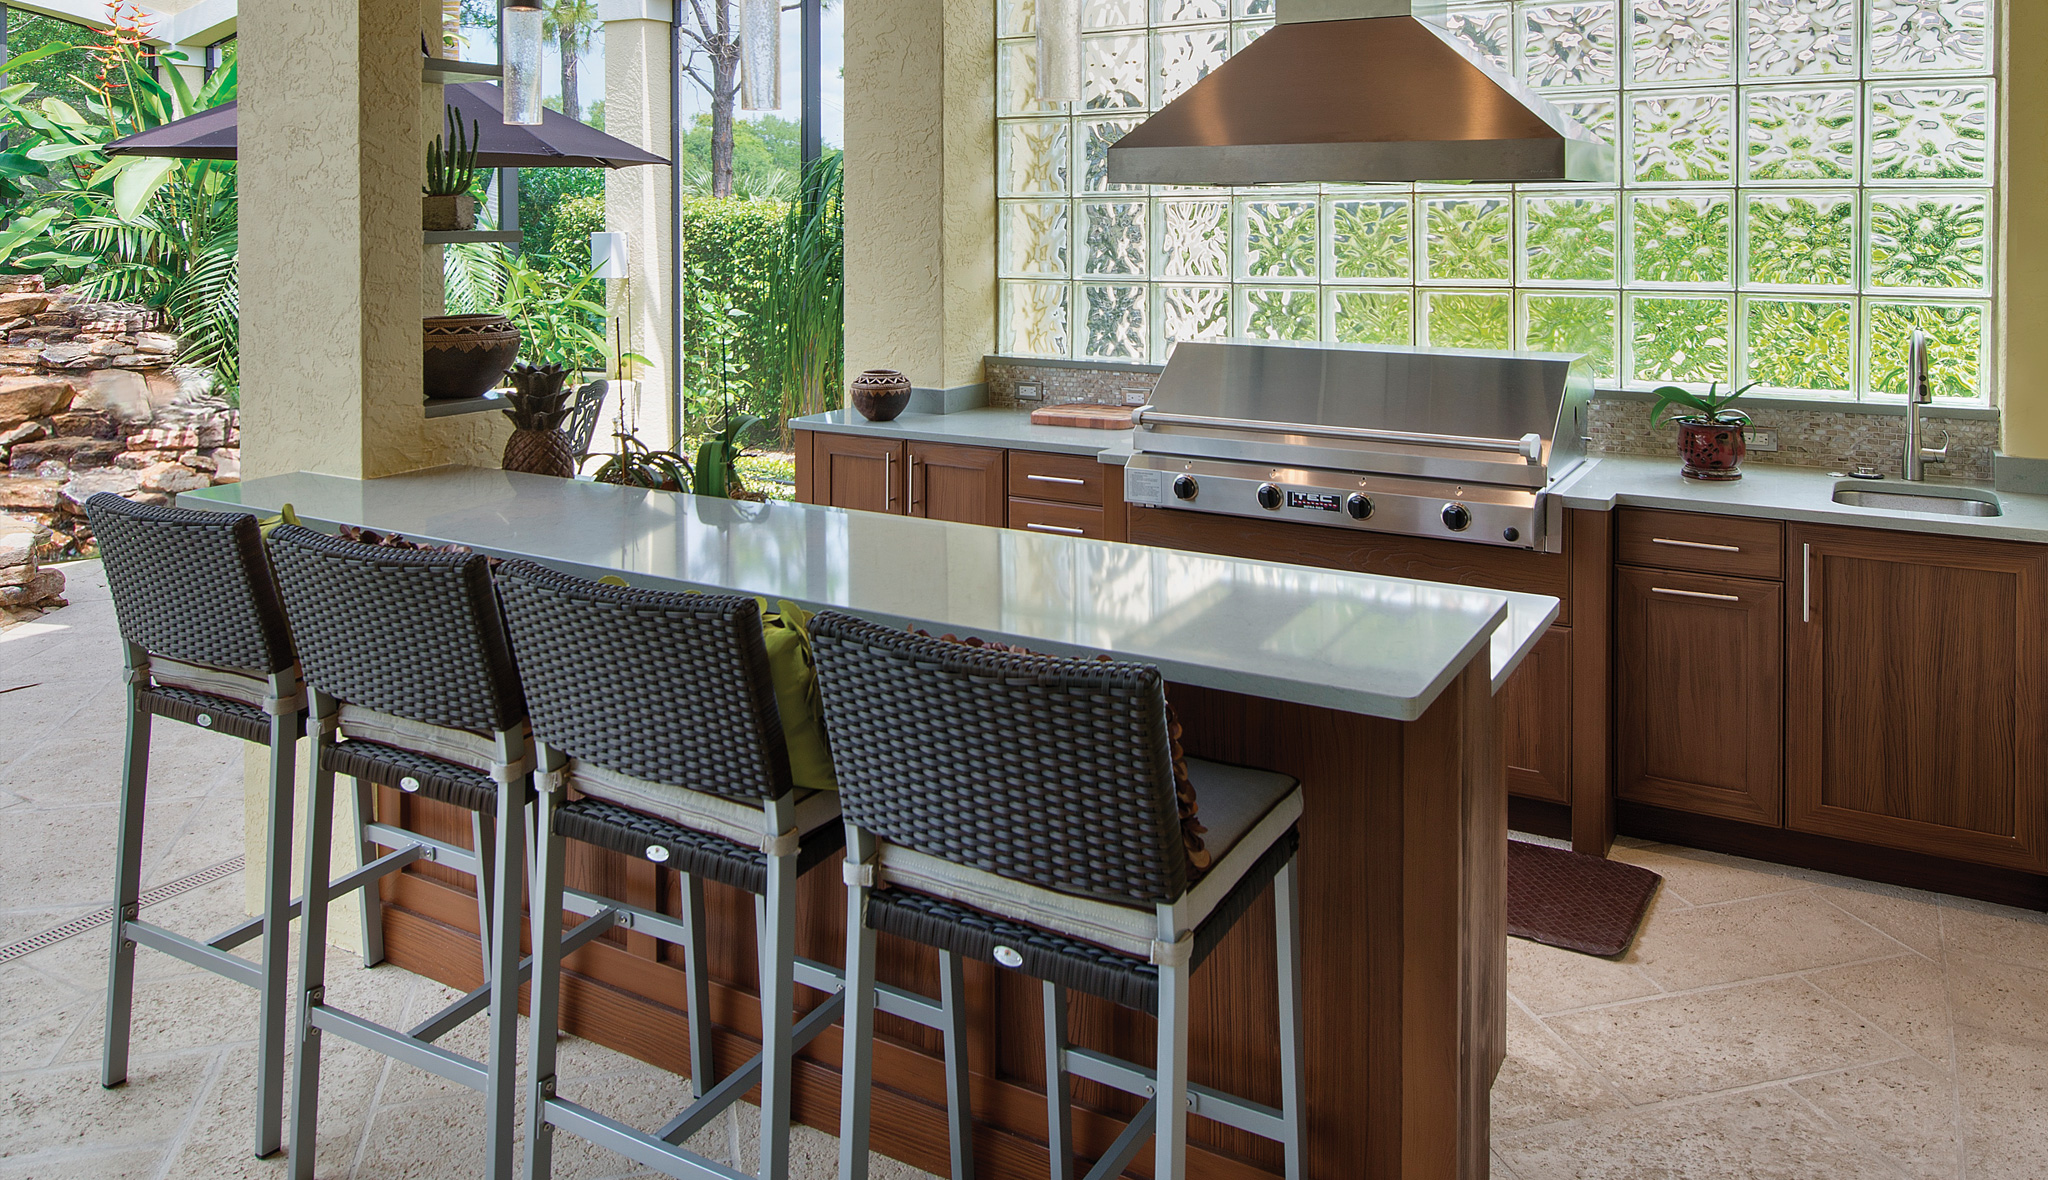 outdoor-summer-kitchen-cabinets-in-melbourne-FL-by-Hammond-Kitchens-and-Bath-slide-3